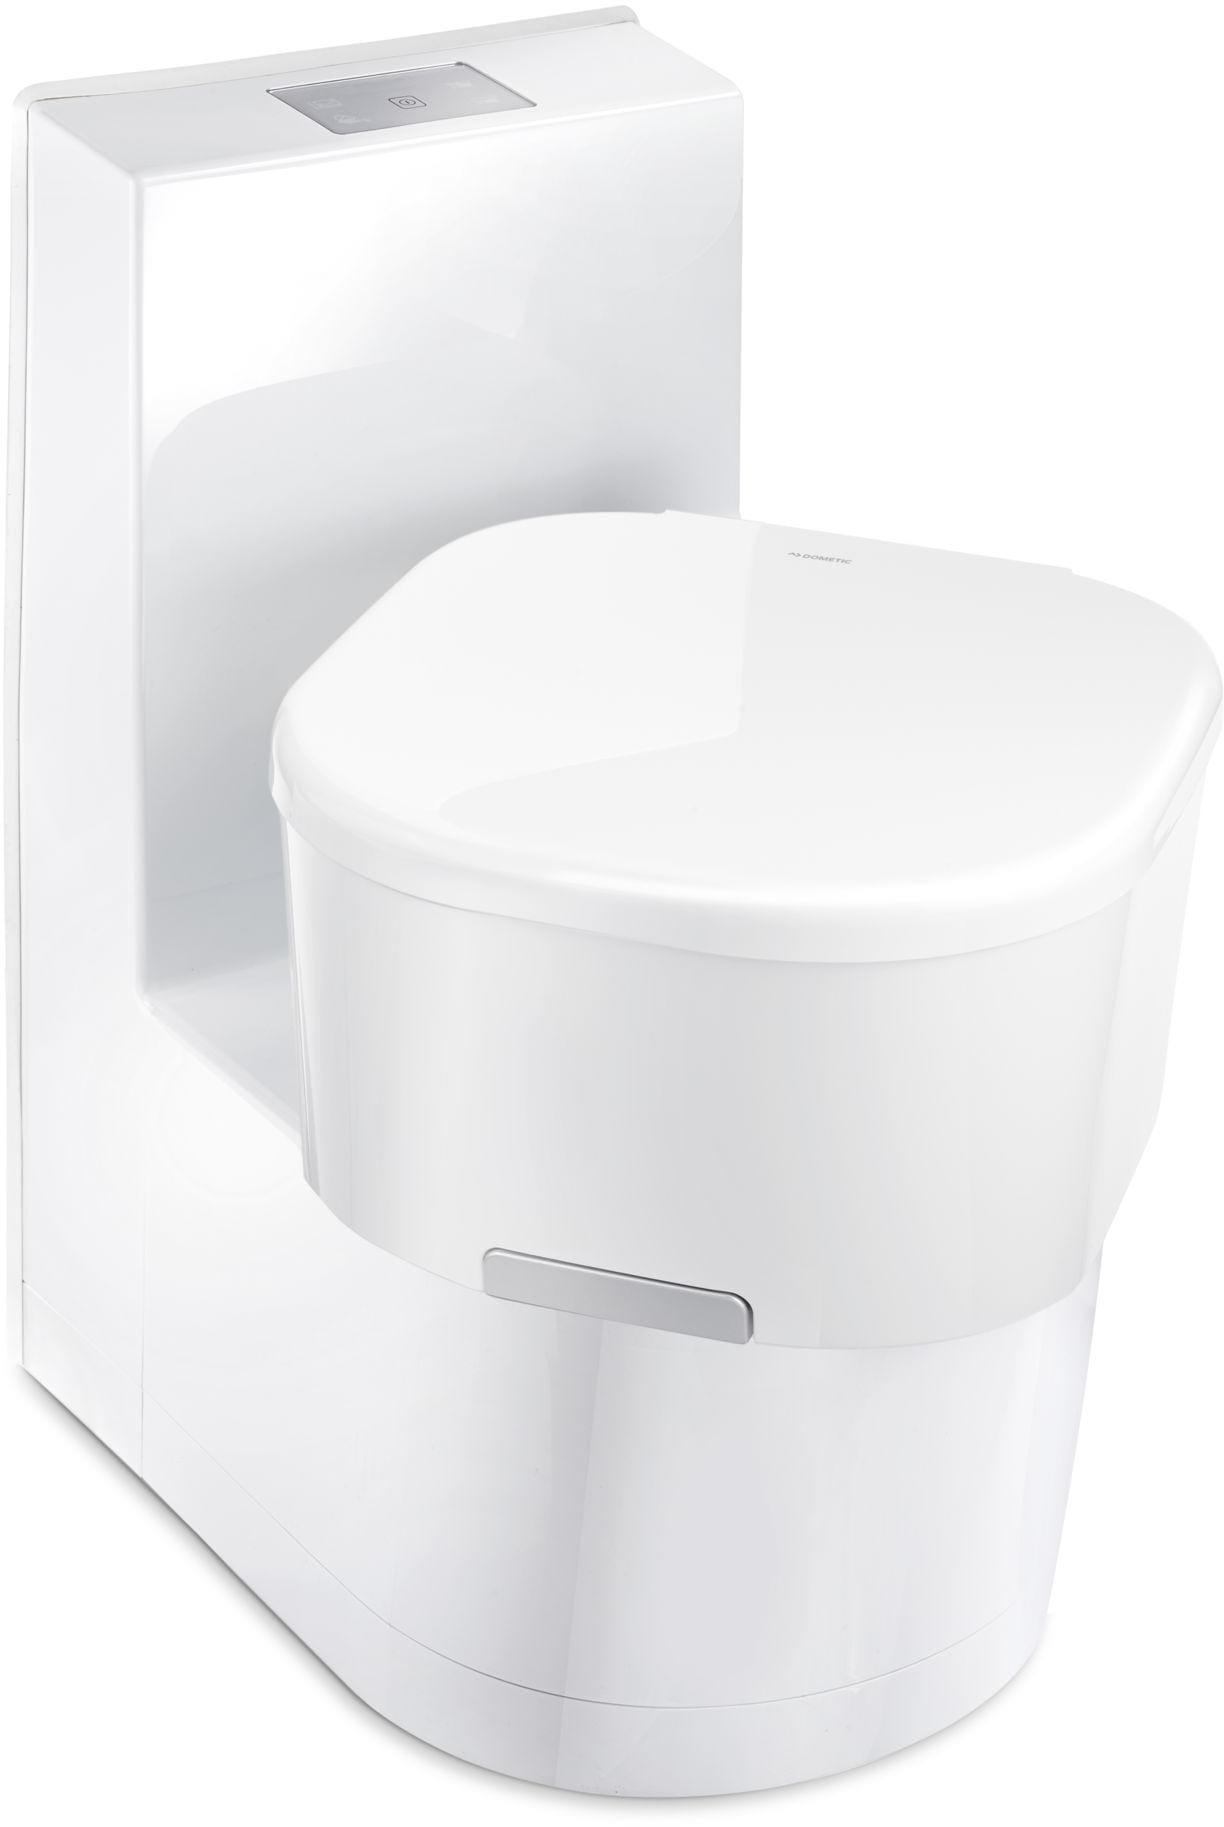 dometic saneo cs cassetten toilette keramik von dometic wasser sanit r bei campingshop wagner. Black Bedroom Furniture Sets. Home Design Ideas